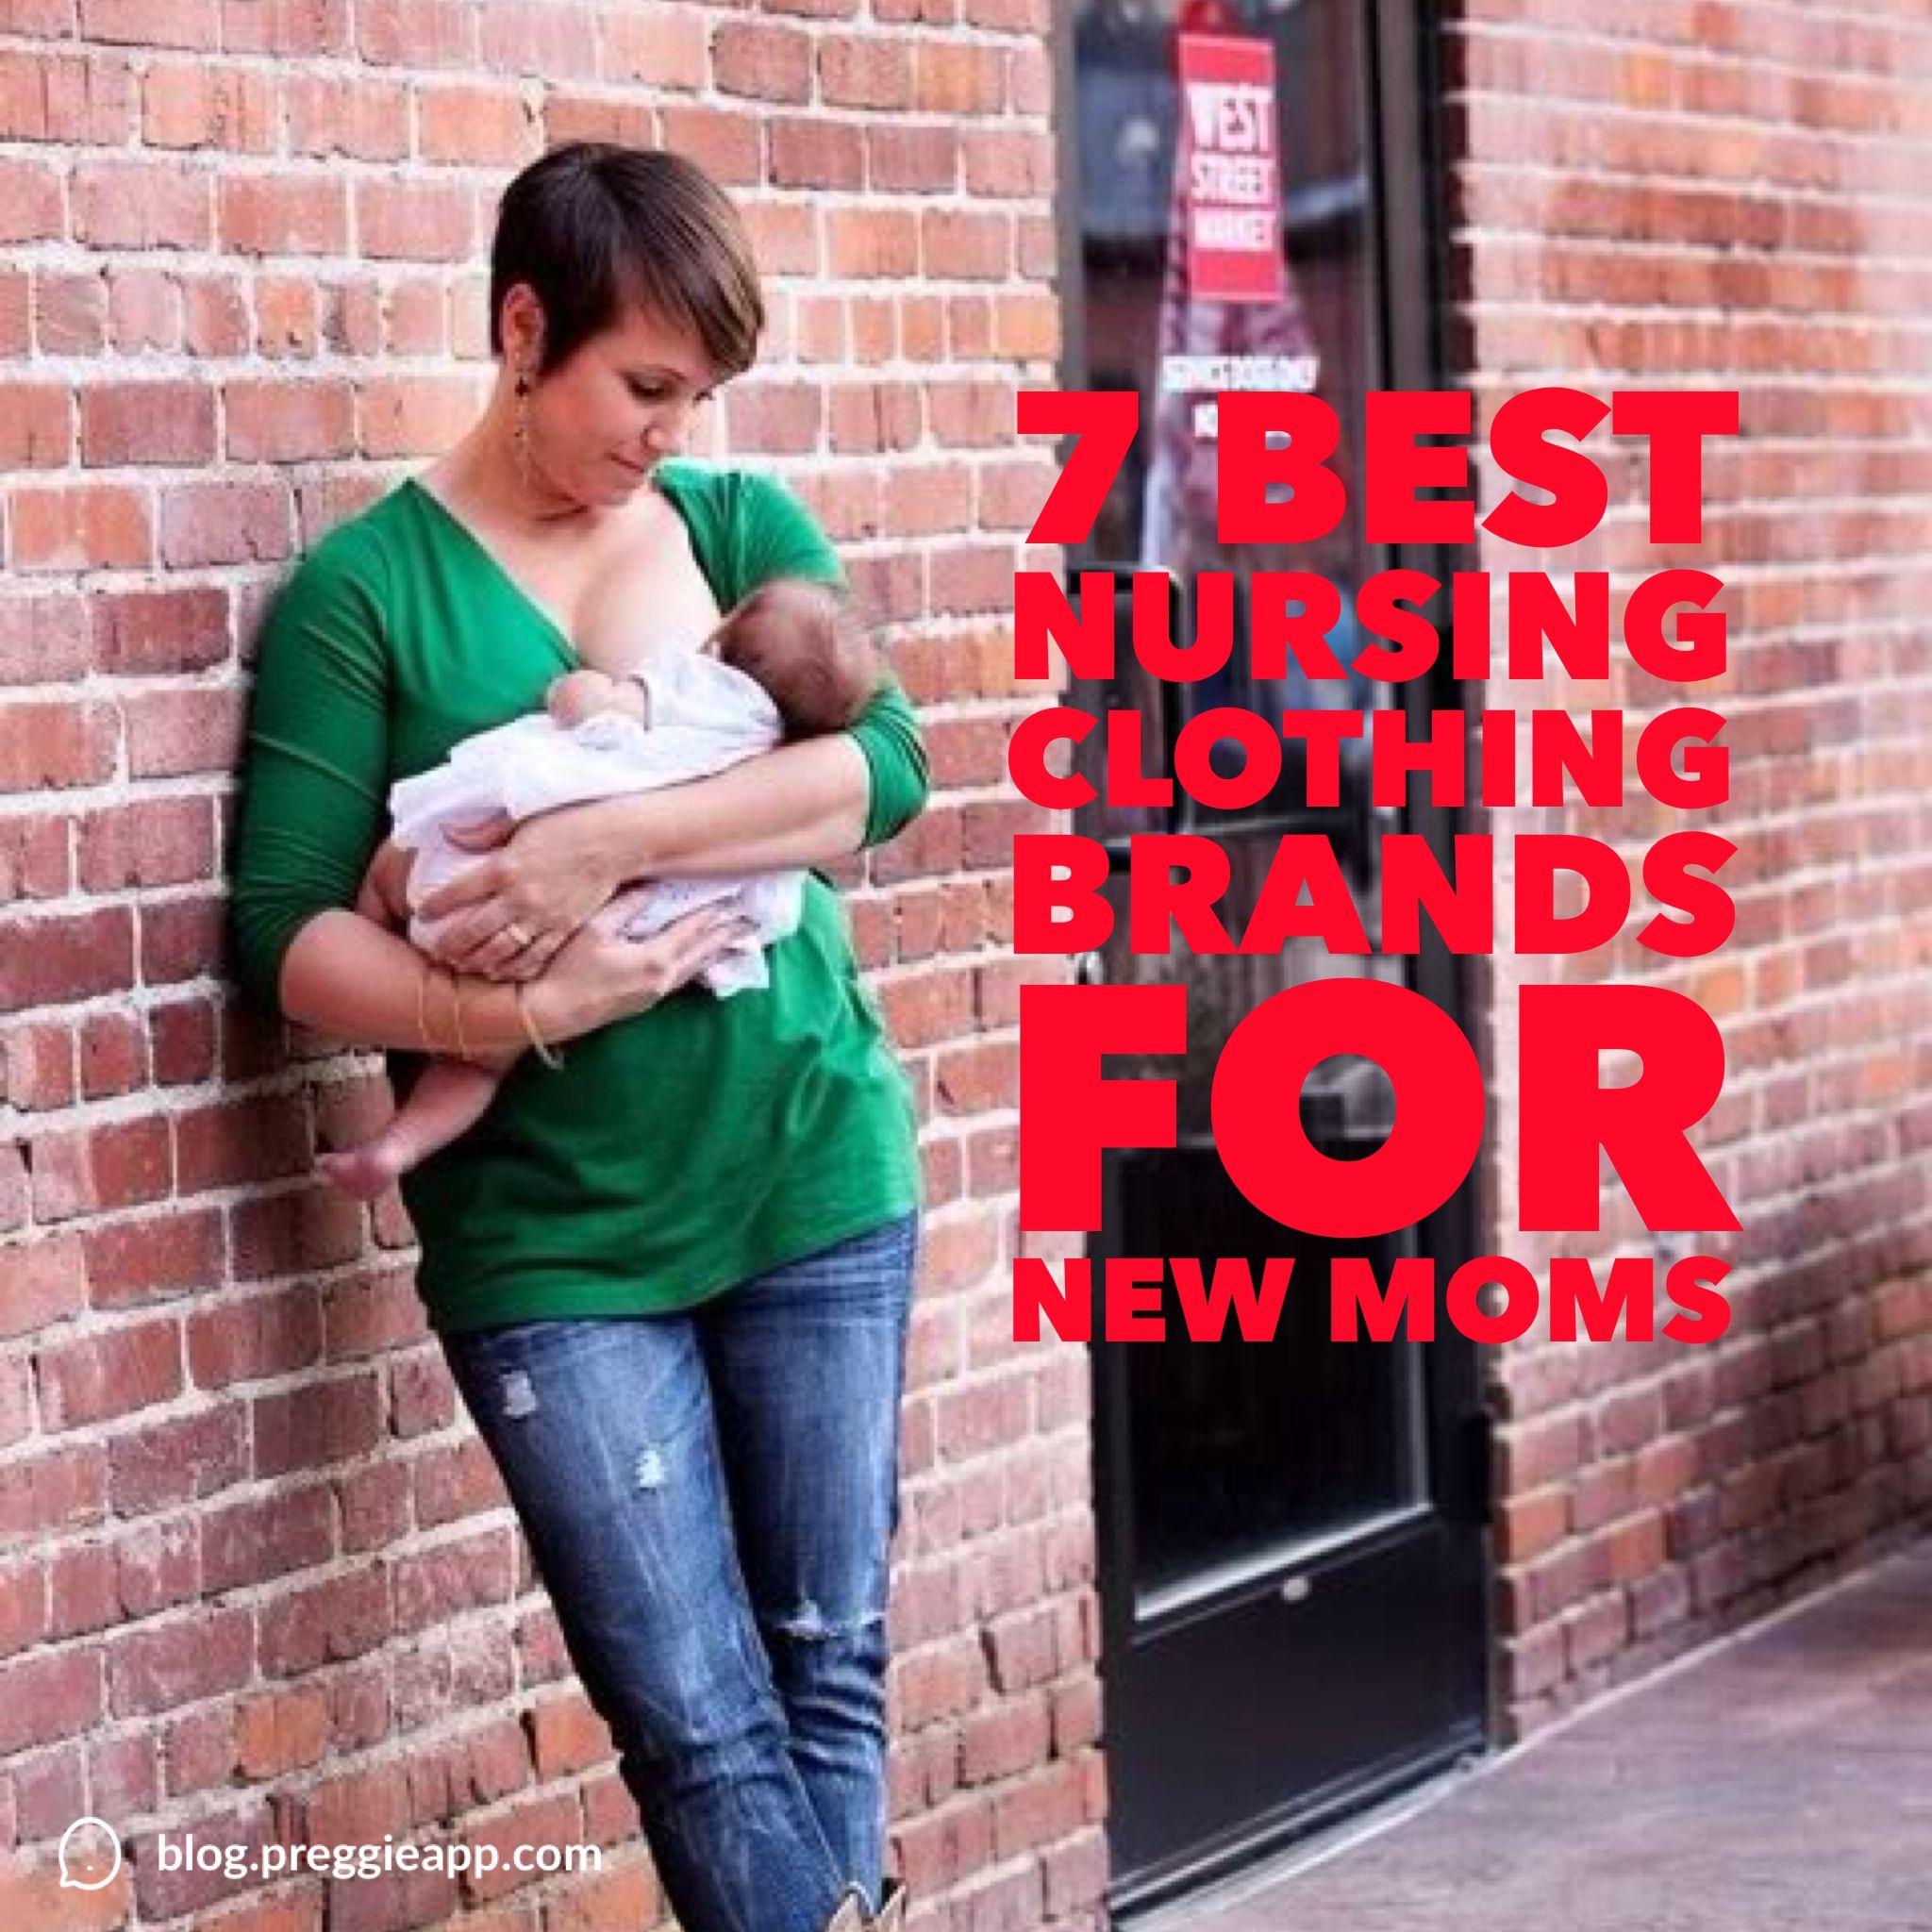 633aee75d24 7 Best Nursing Clothing Brands for New Moms   mom.life app #breastfeeding